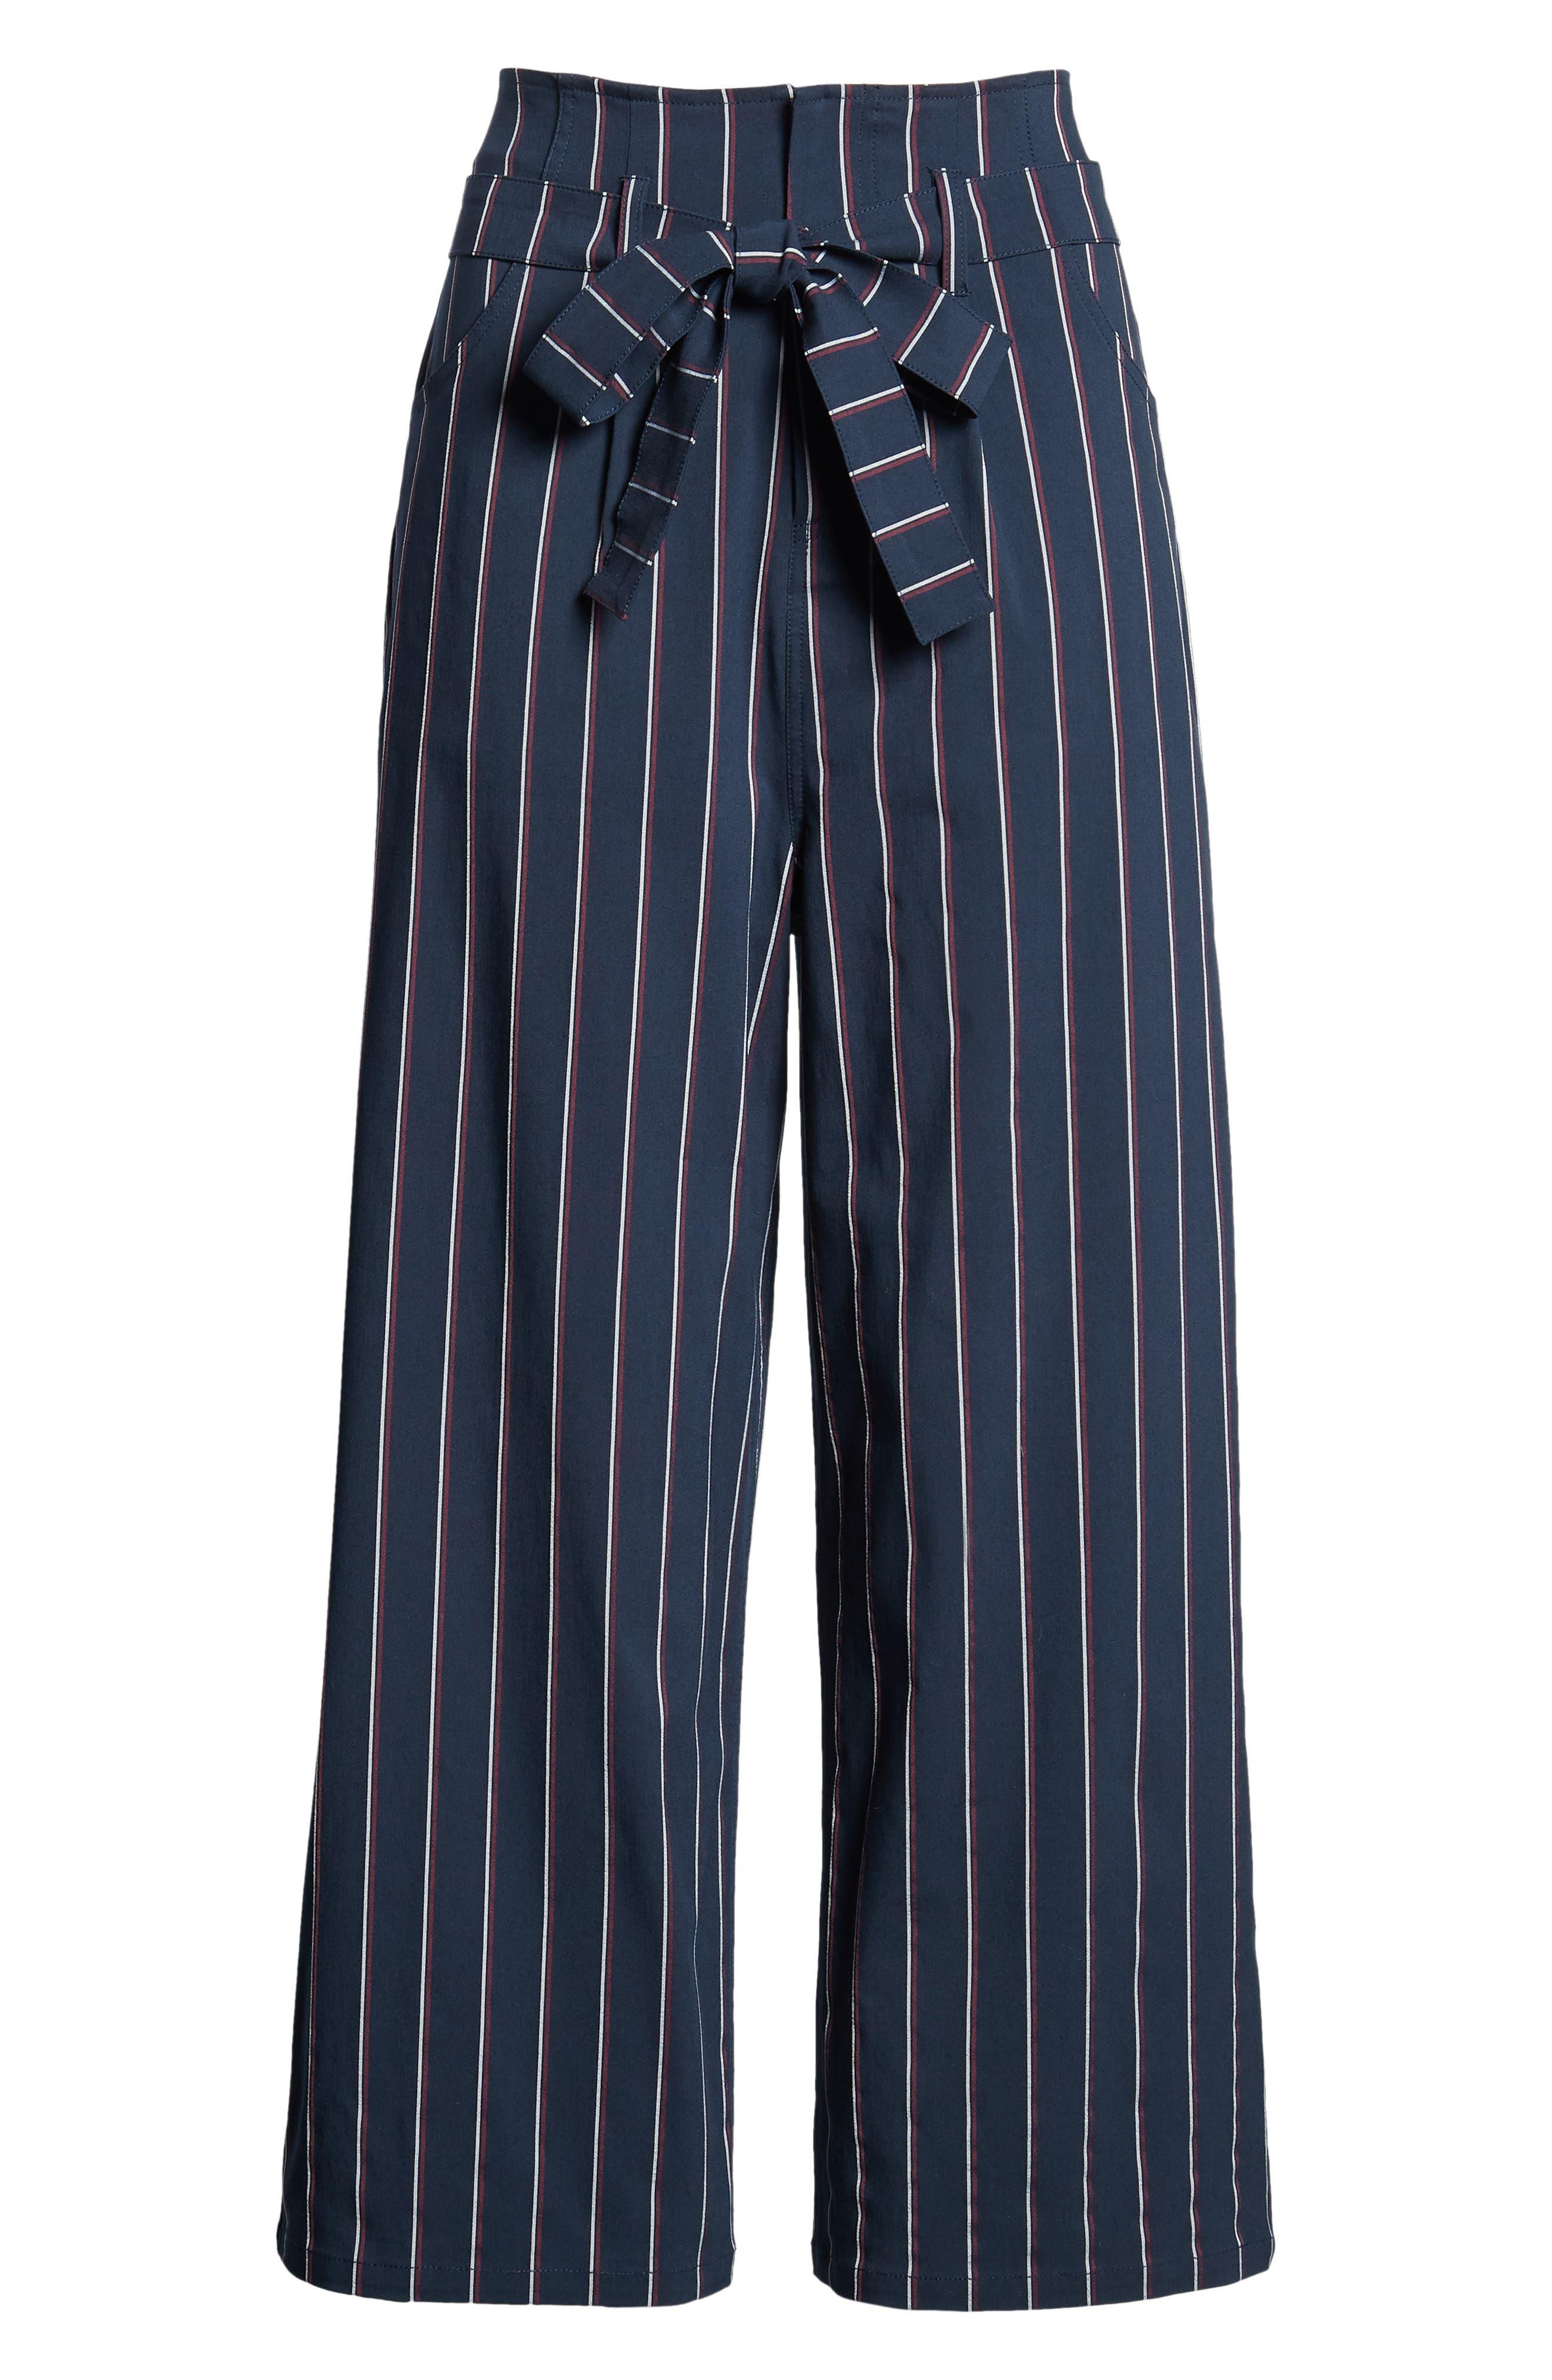 Tie Waist Crop Trousers,                             Alternate thumbnail 7, color,                             Navy Night Stripe